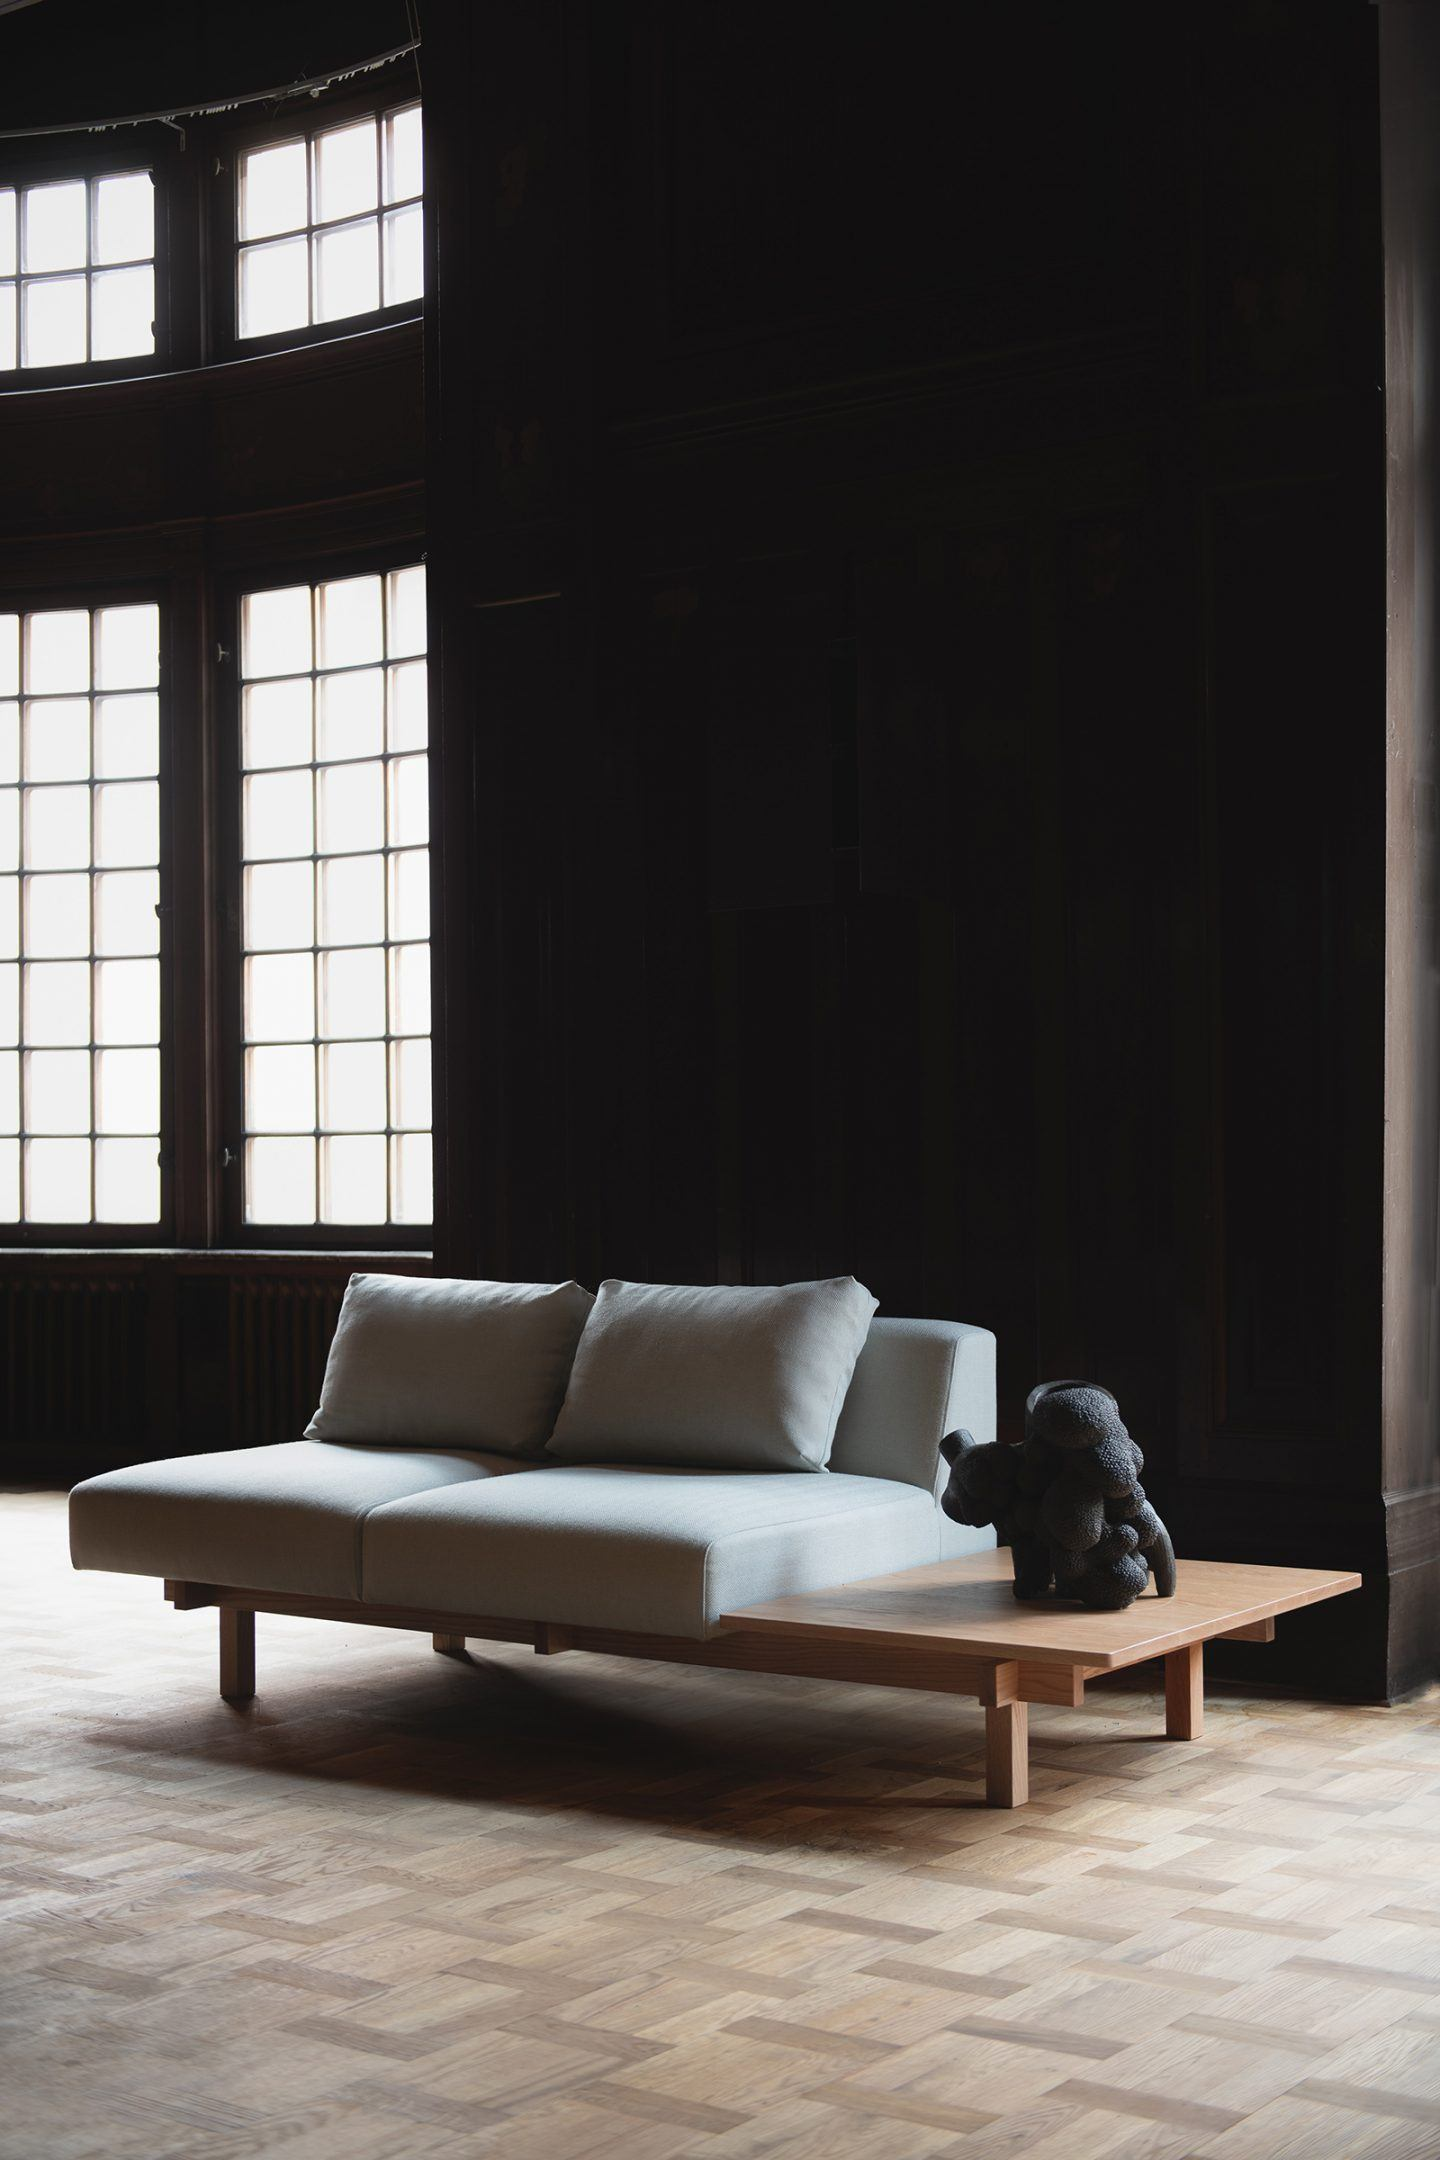 This Sofa By Keiji Ashizawa Merges Japanese Craft And Contemporary Luxury - IGNANT